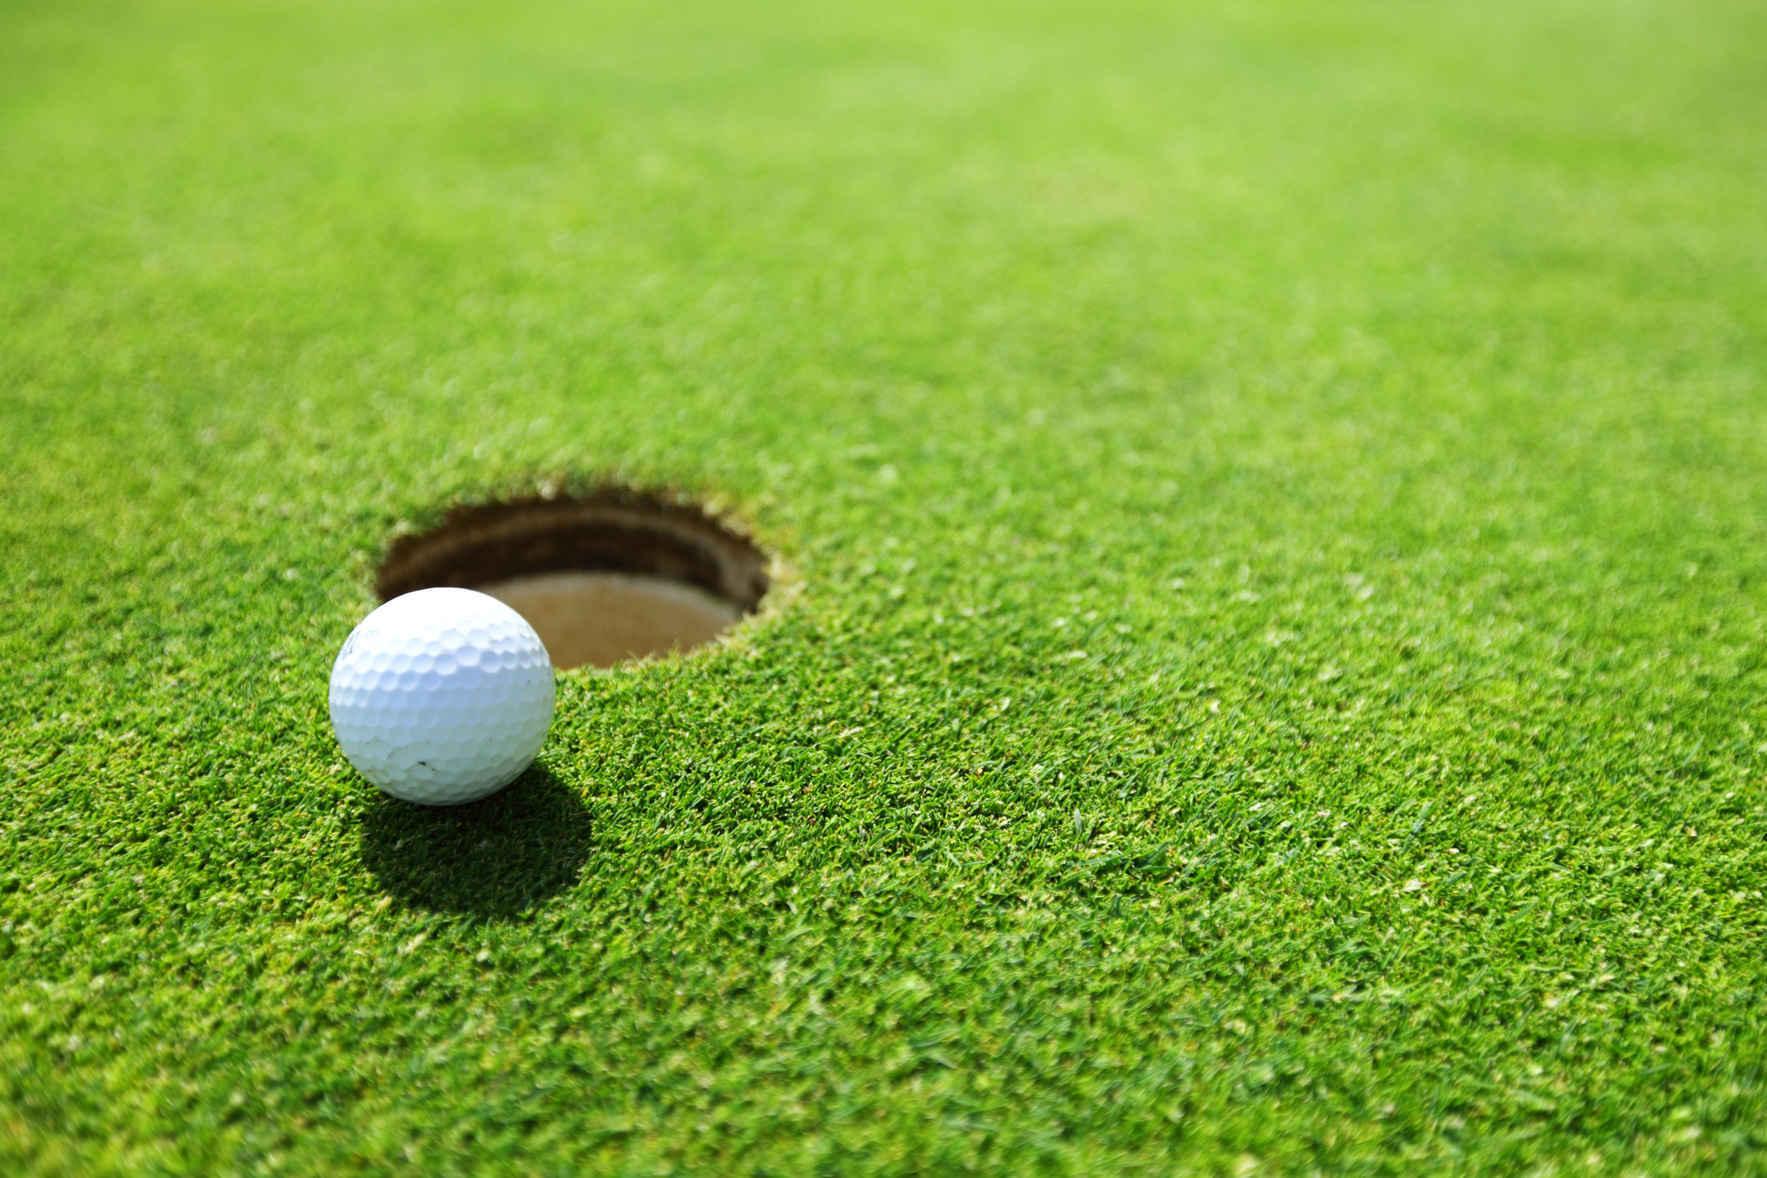 Healing Arts Institute 2nd Annual Children's Mental Health Awareness Charity Golf Tournament image